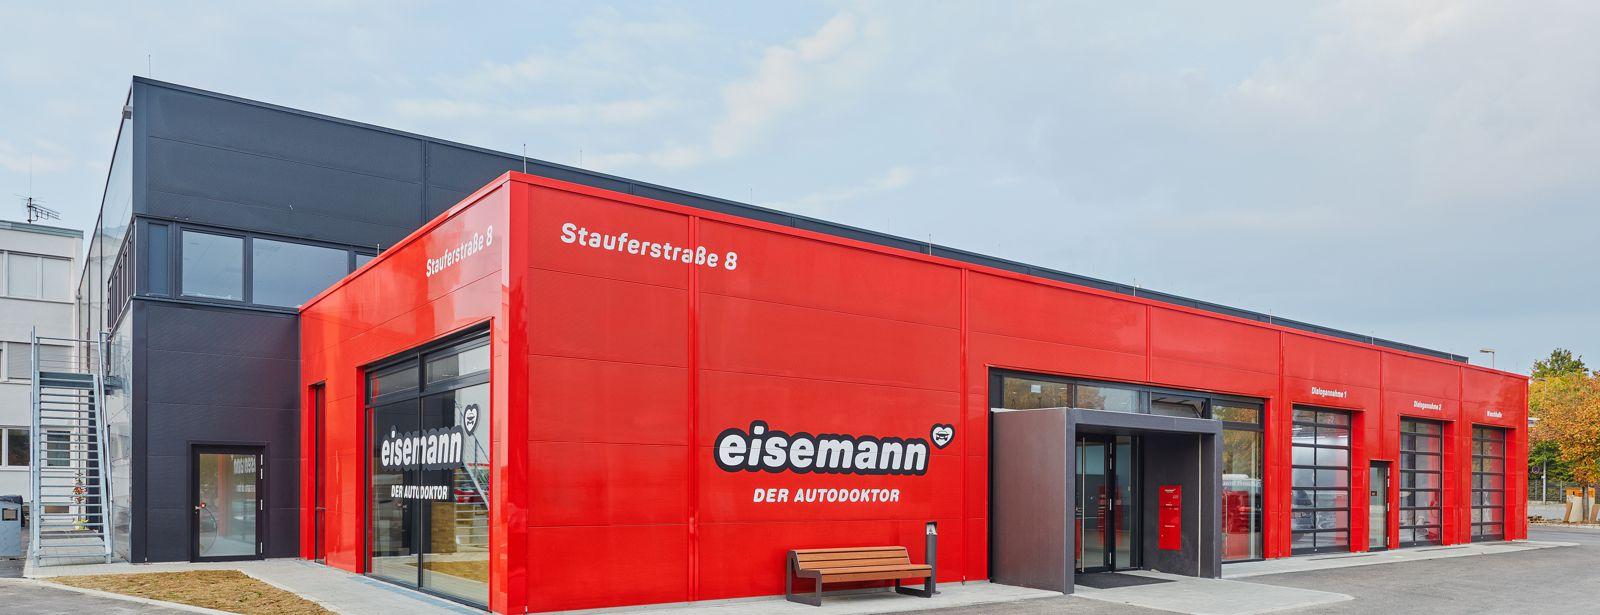 Eisemann Fellbach